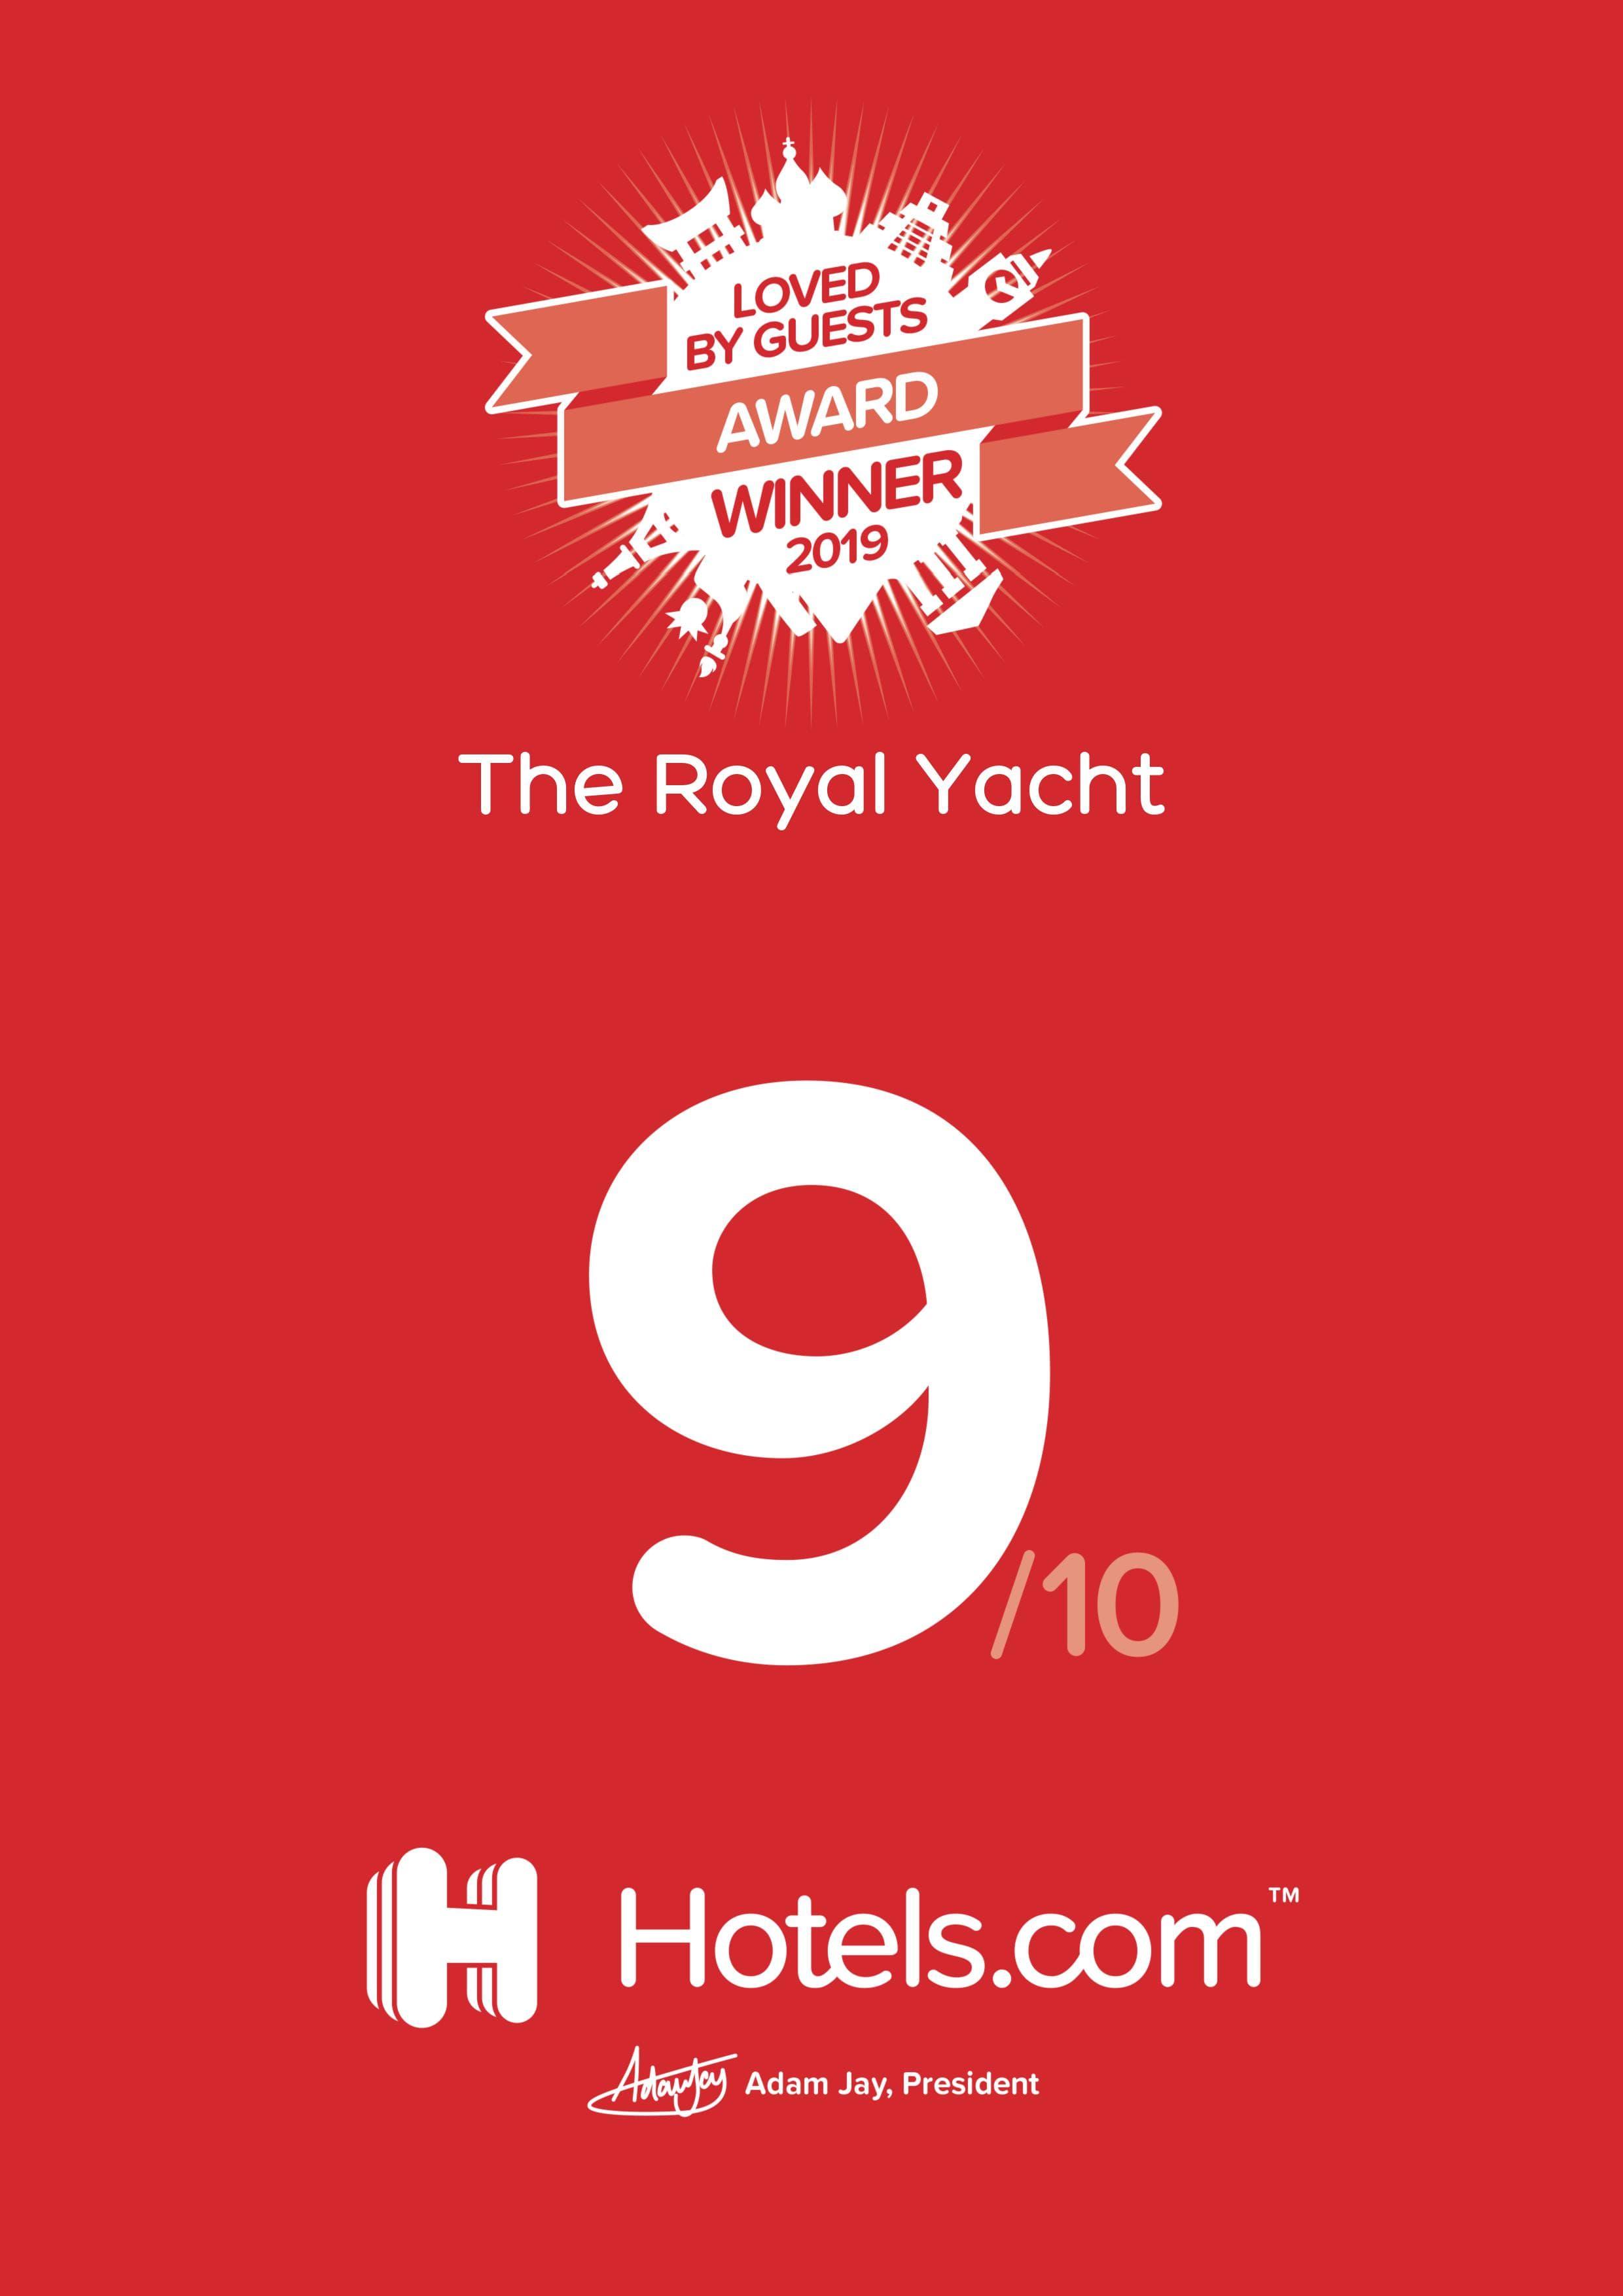 RY Hotels.com Winner